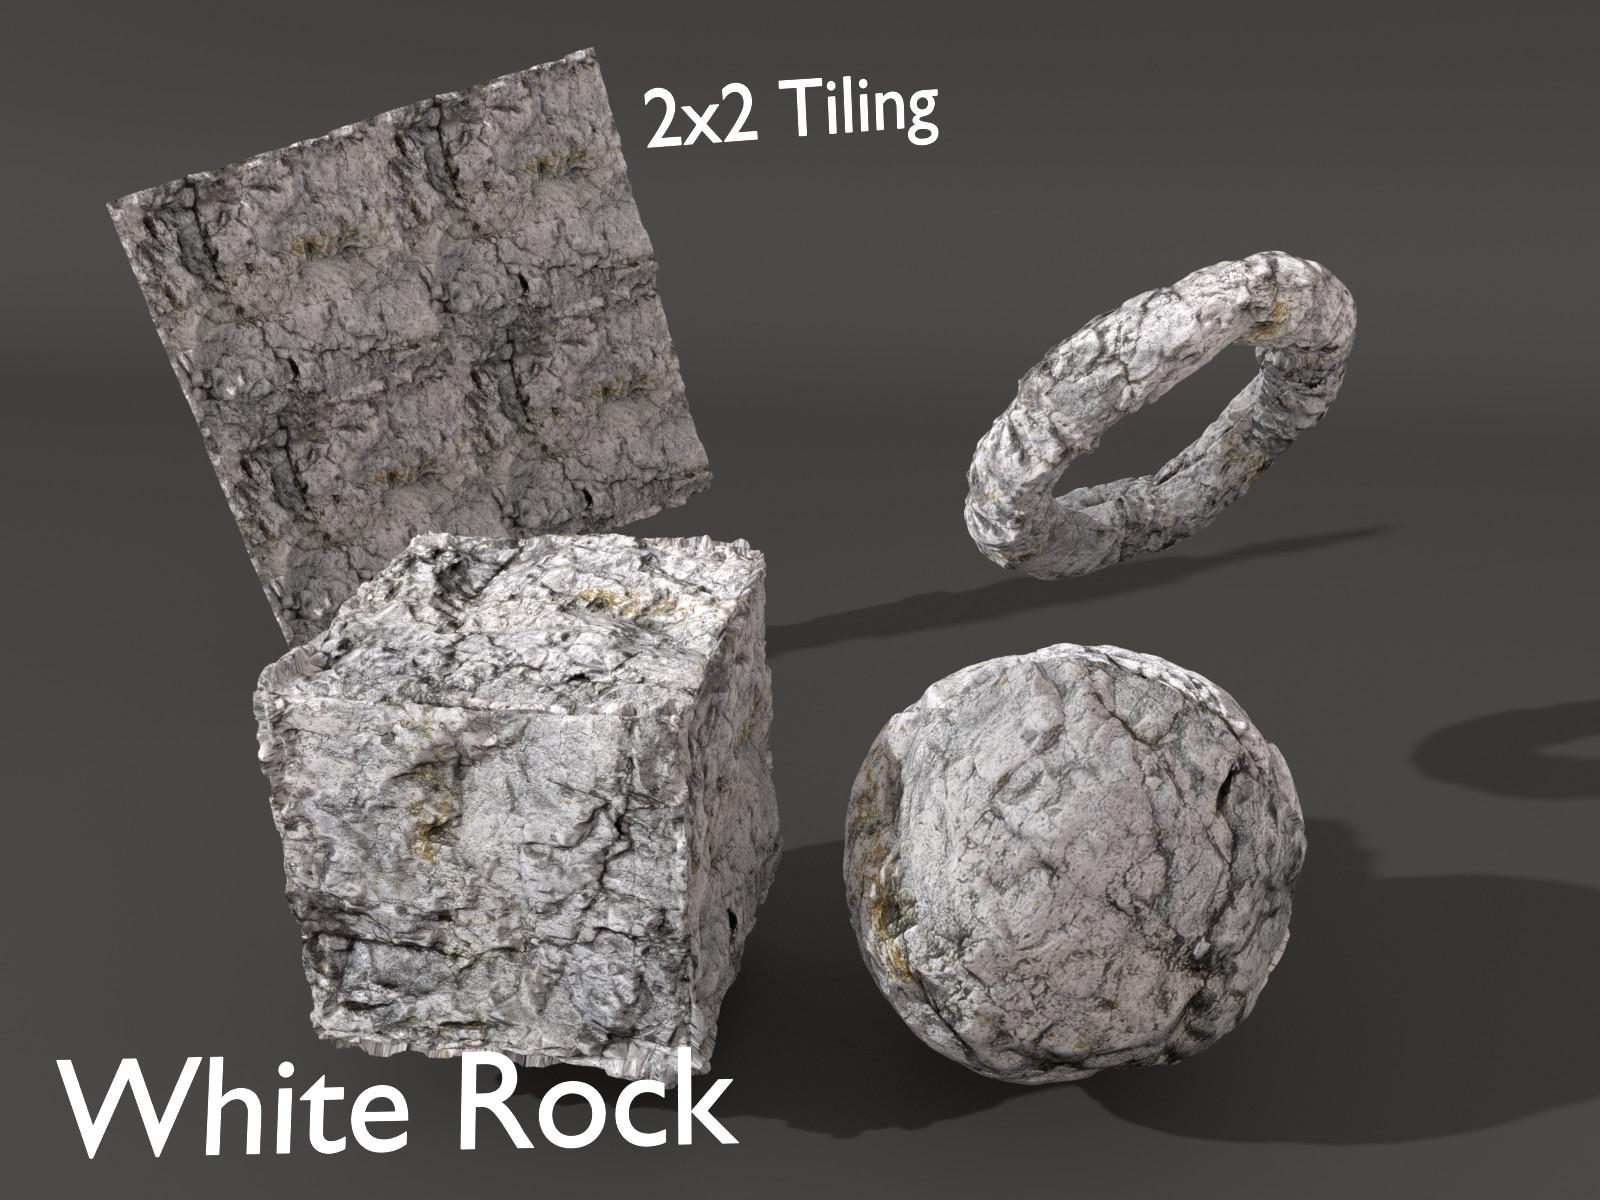 Sieben corgie whiterock p